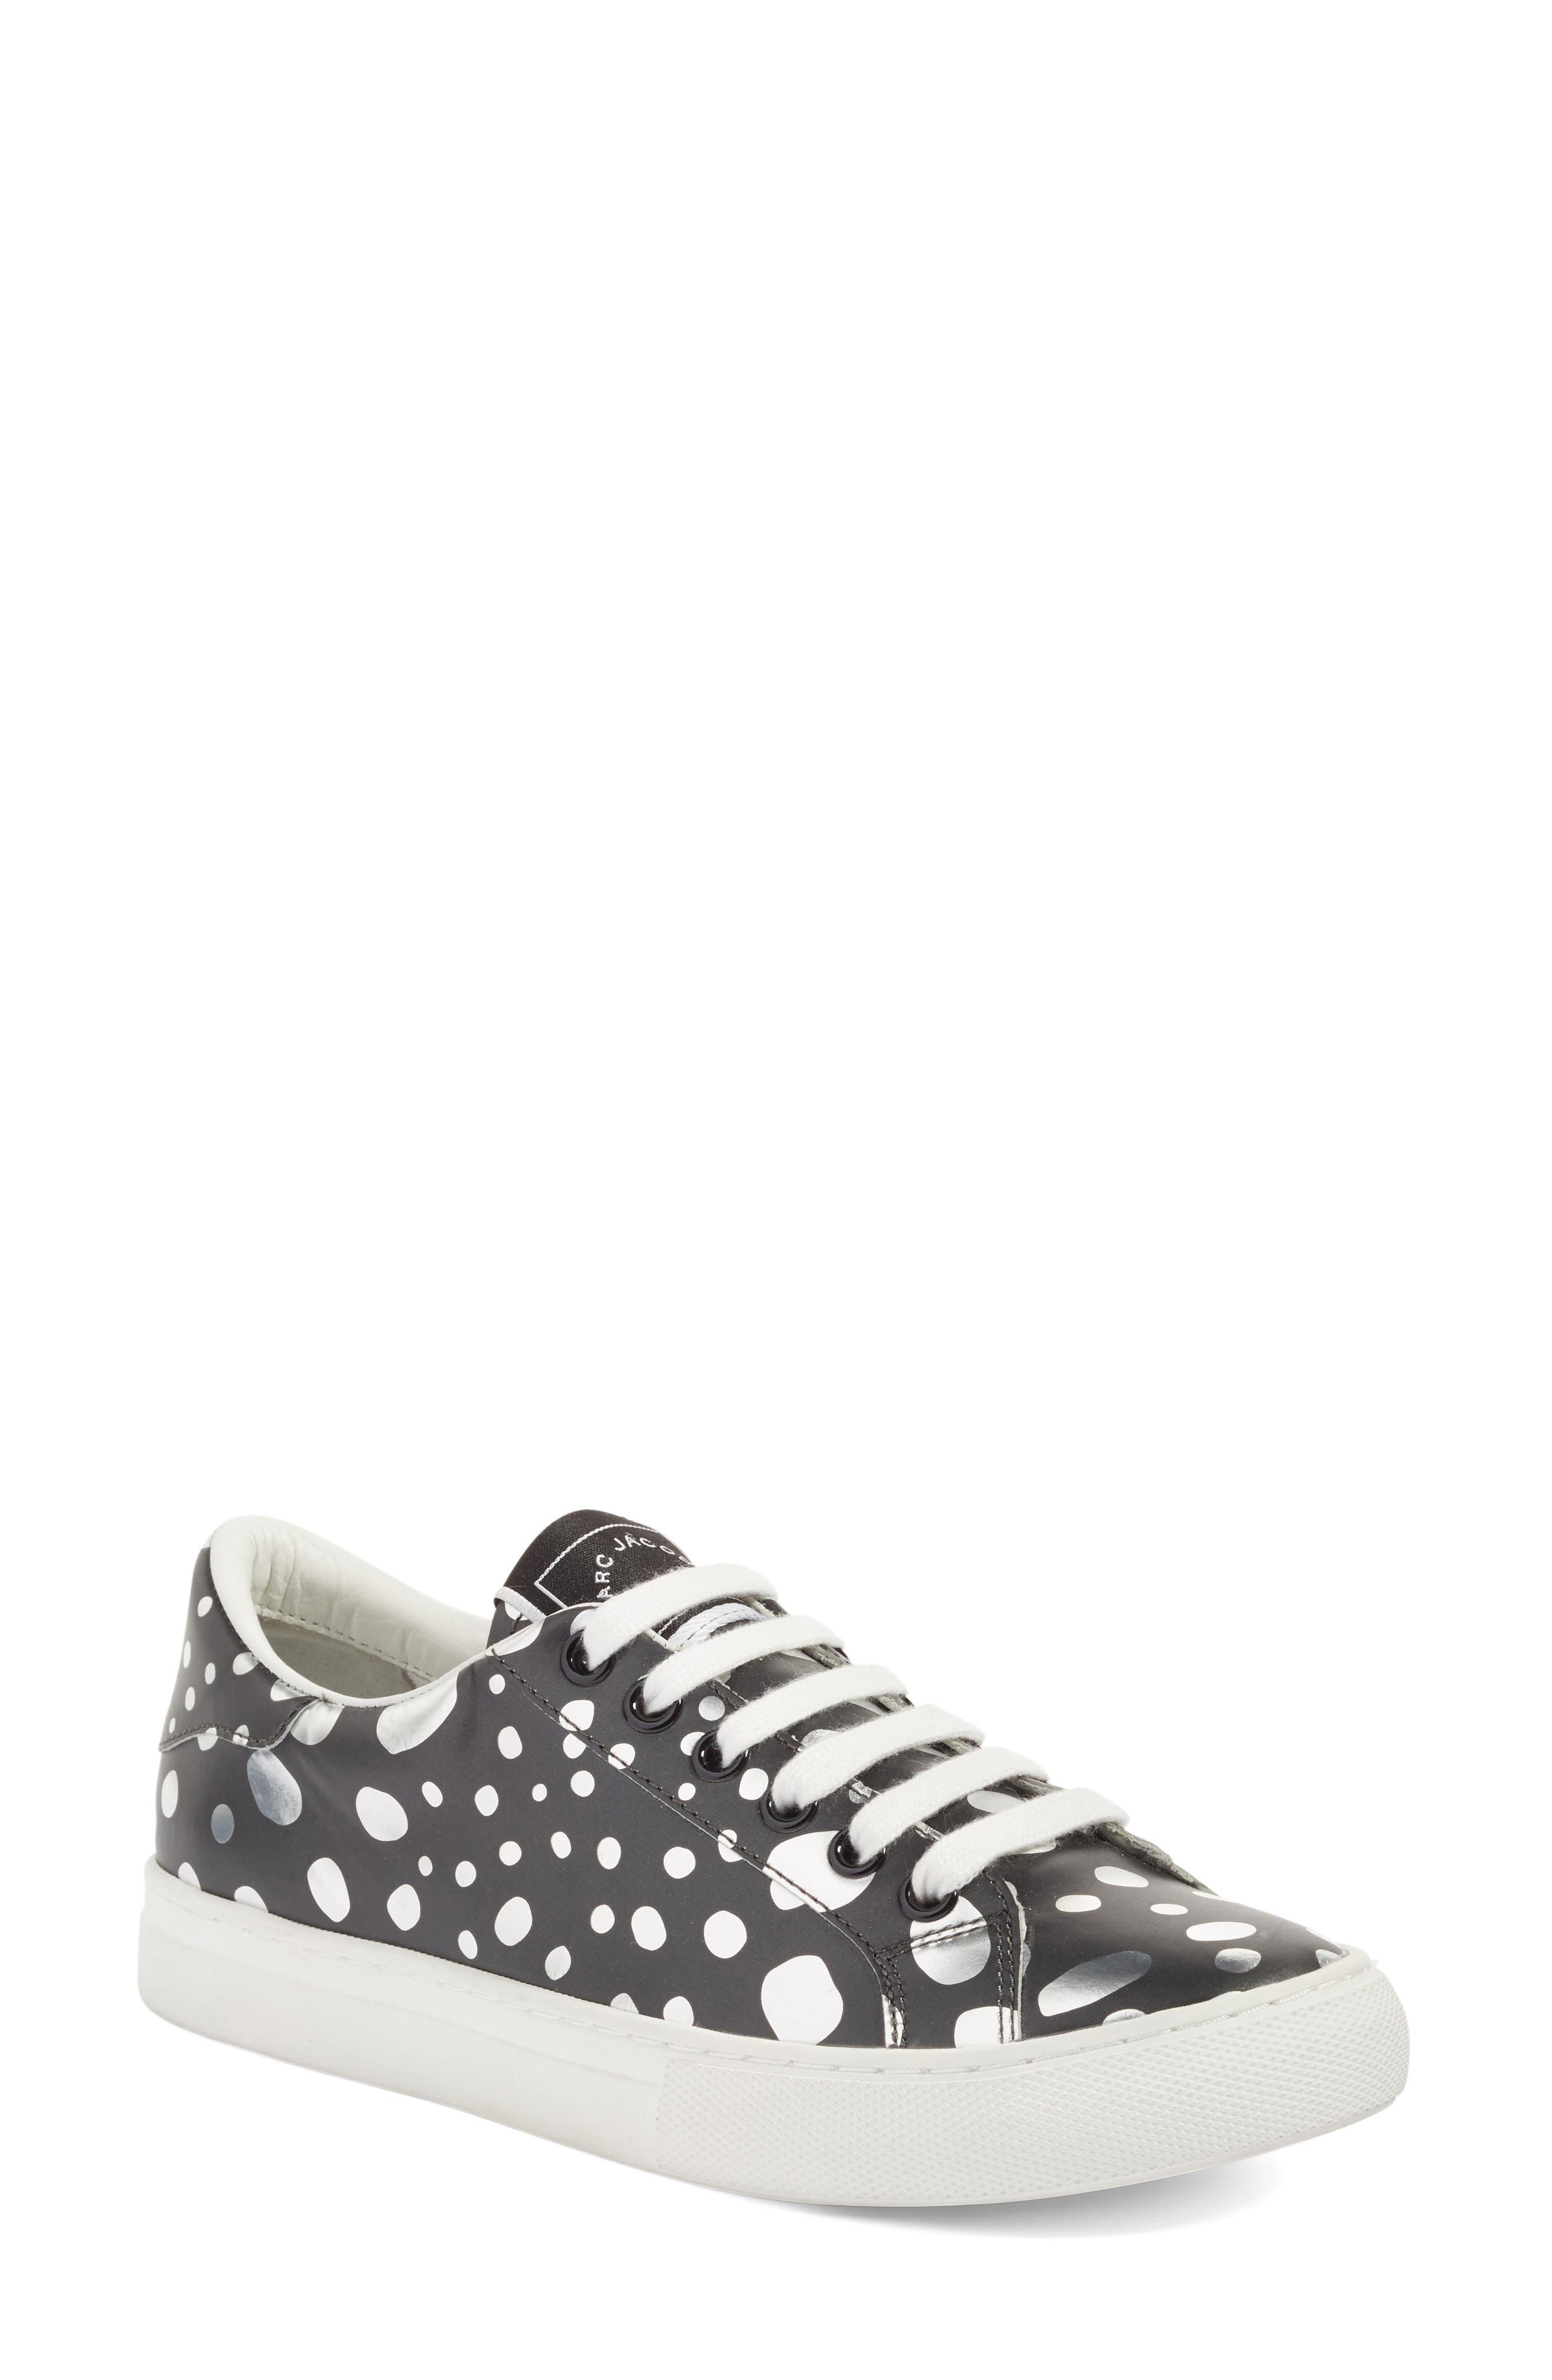 MARC JACOBS Empire Sneaker (Women)